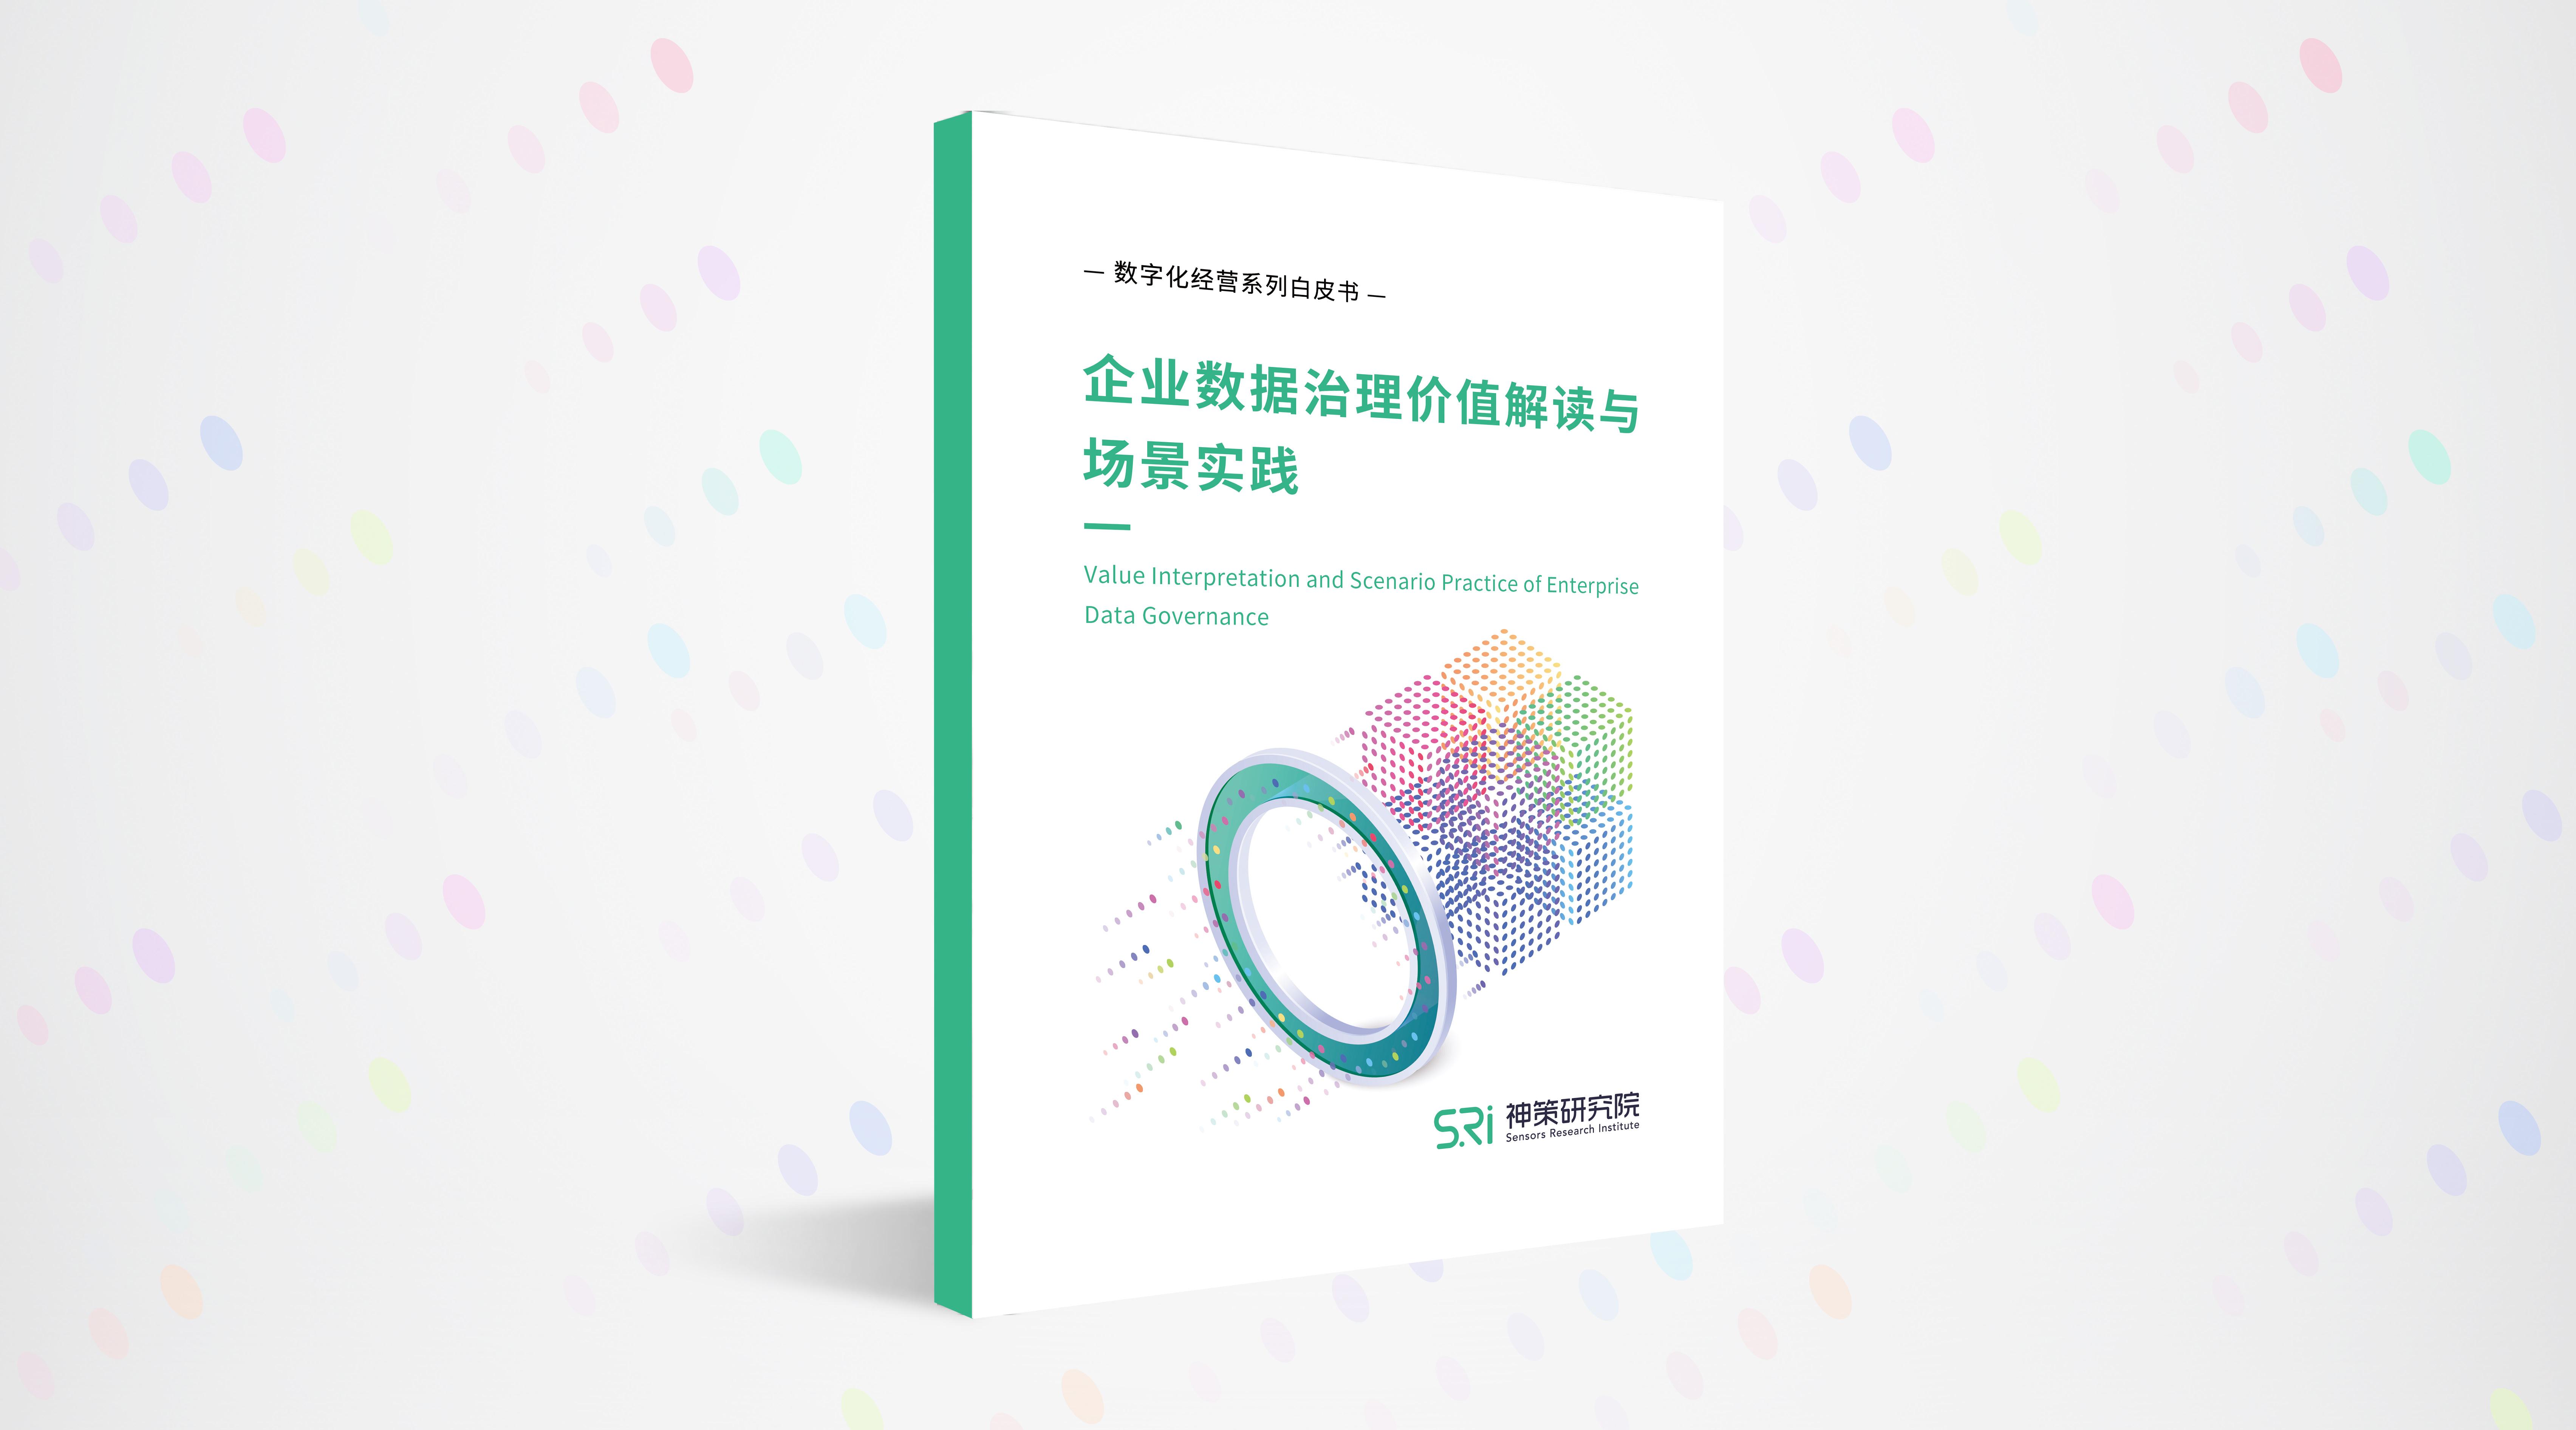 https://ow-file.sensorsdata.cn/miniprogram/uploads/《企业数据治理价值解读与场景实践》白皮书 2021.pdf